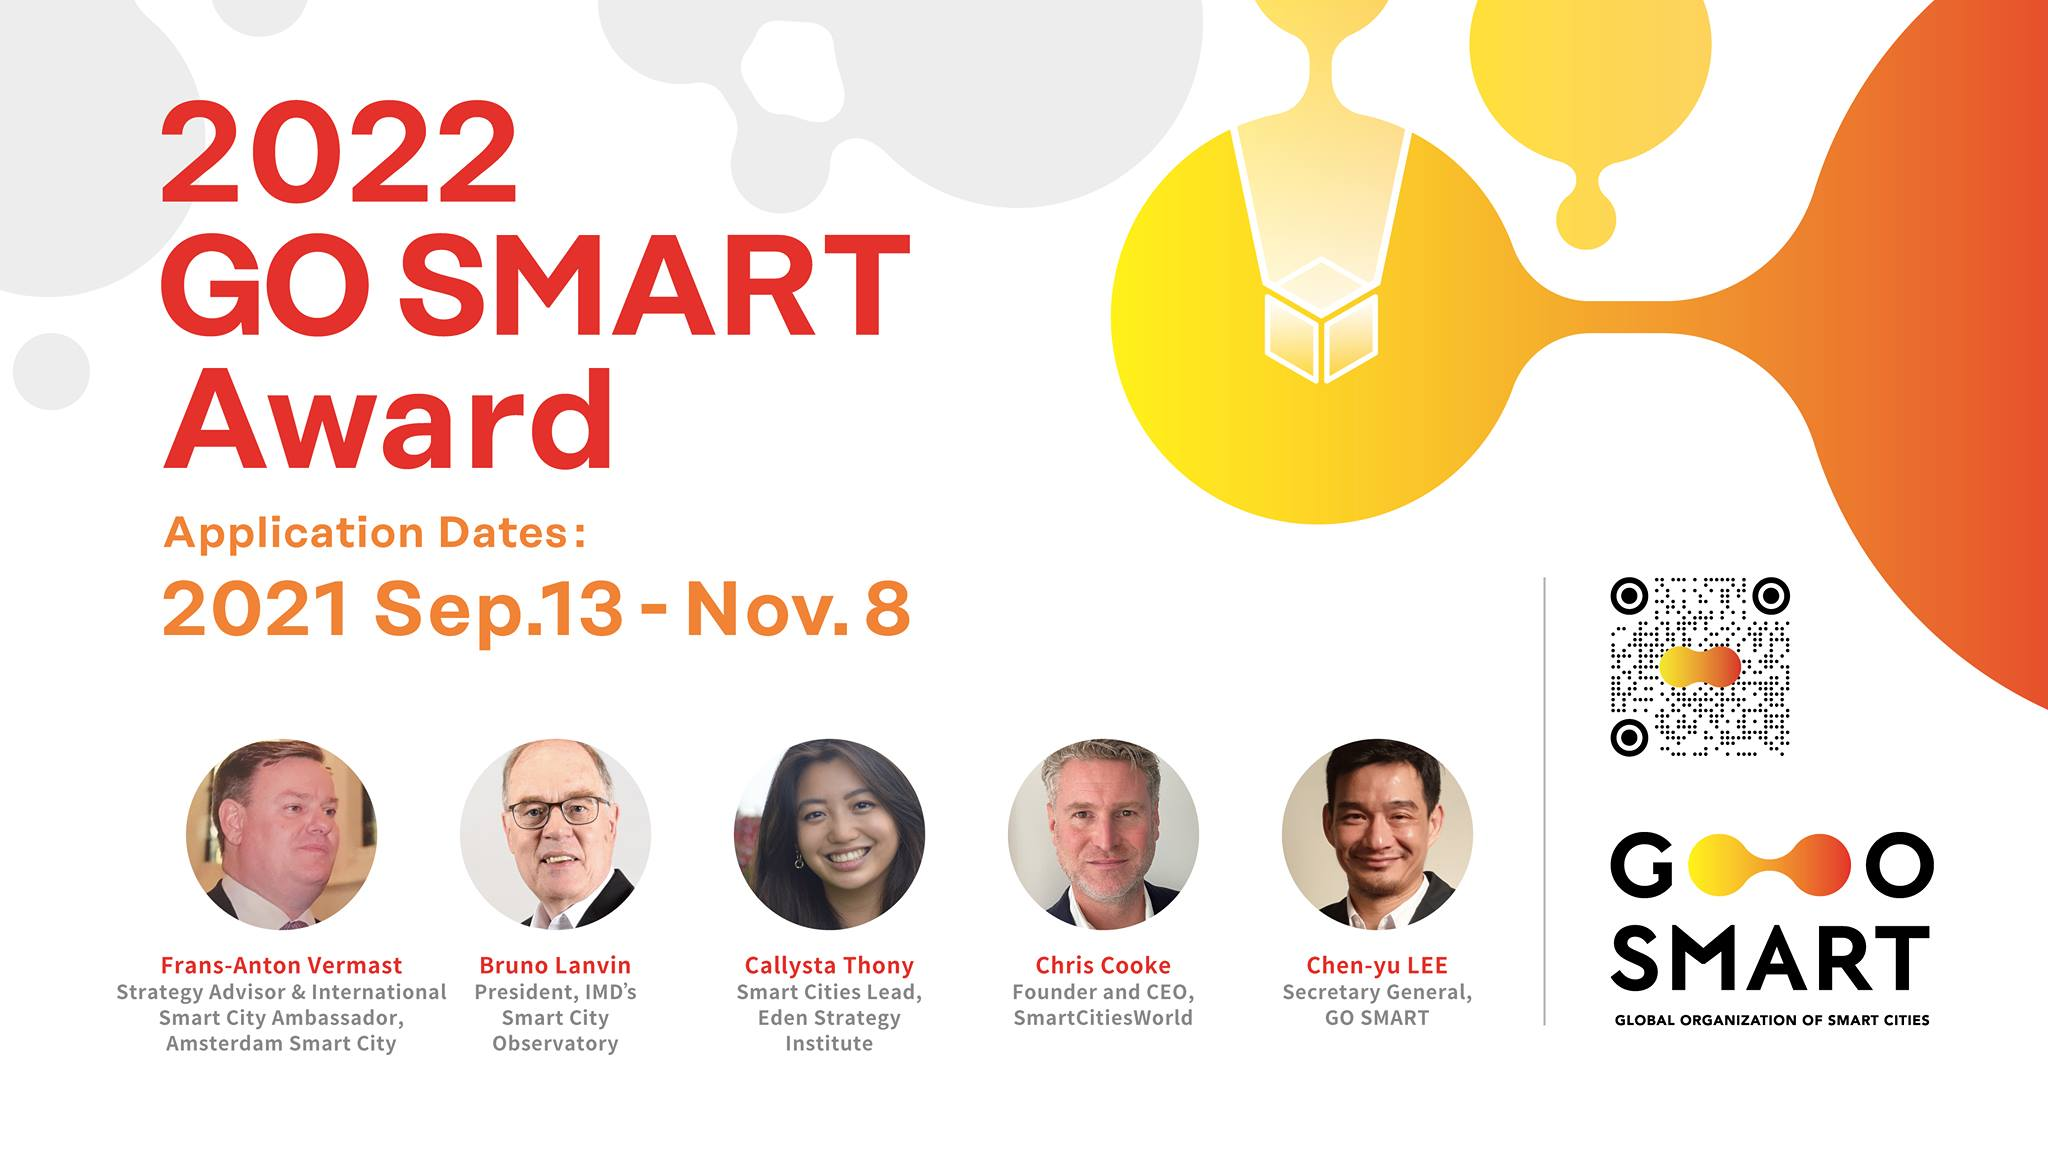 2022 GO SMART Award Call for Solutions